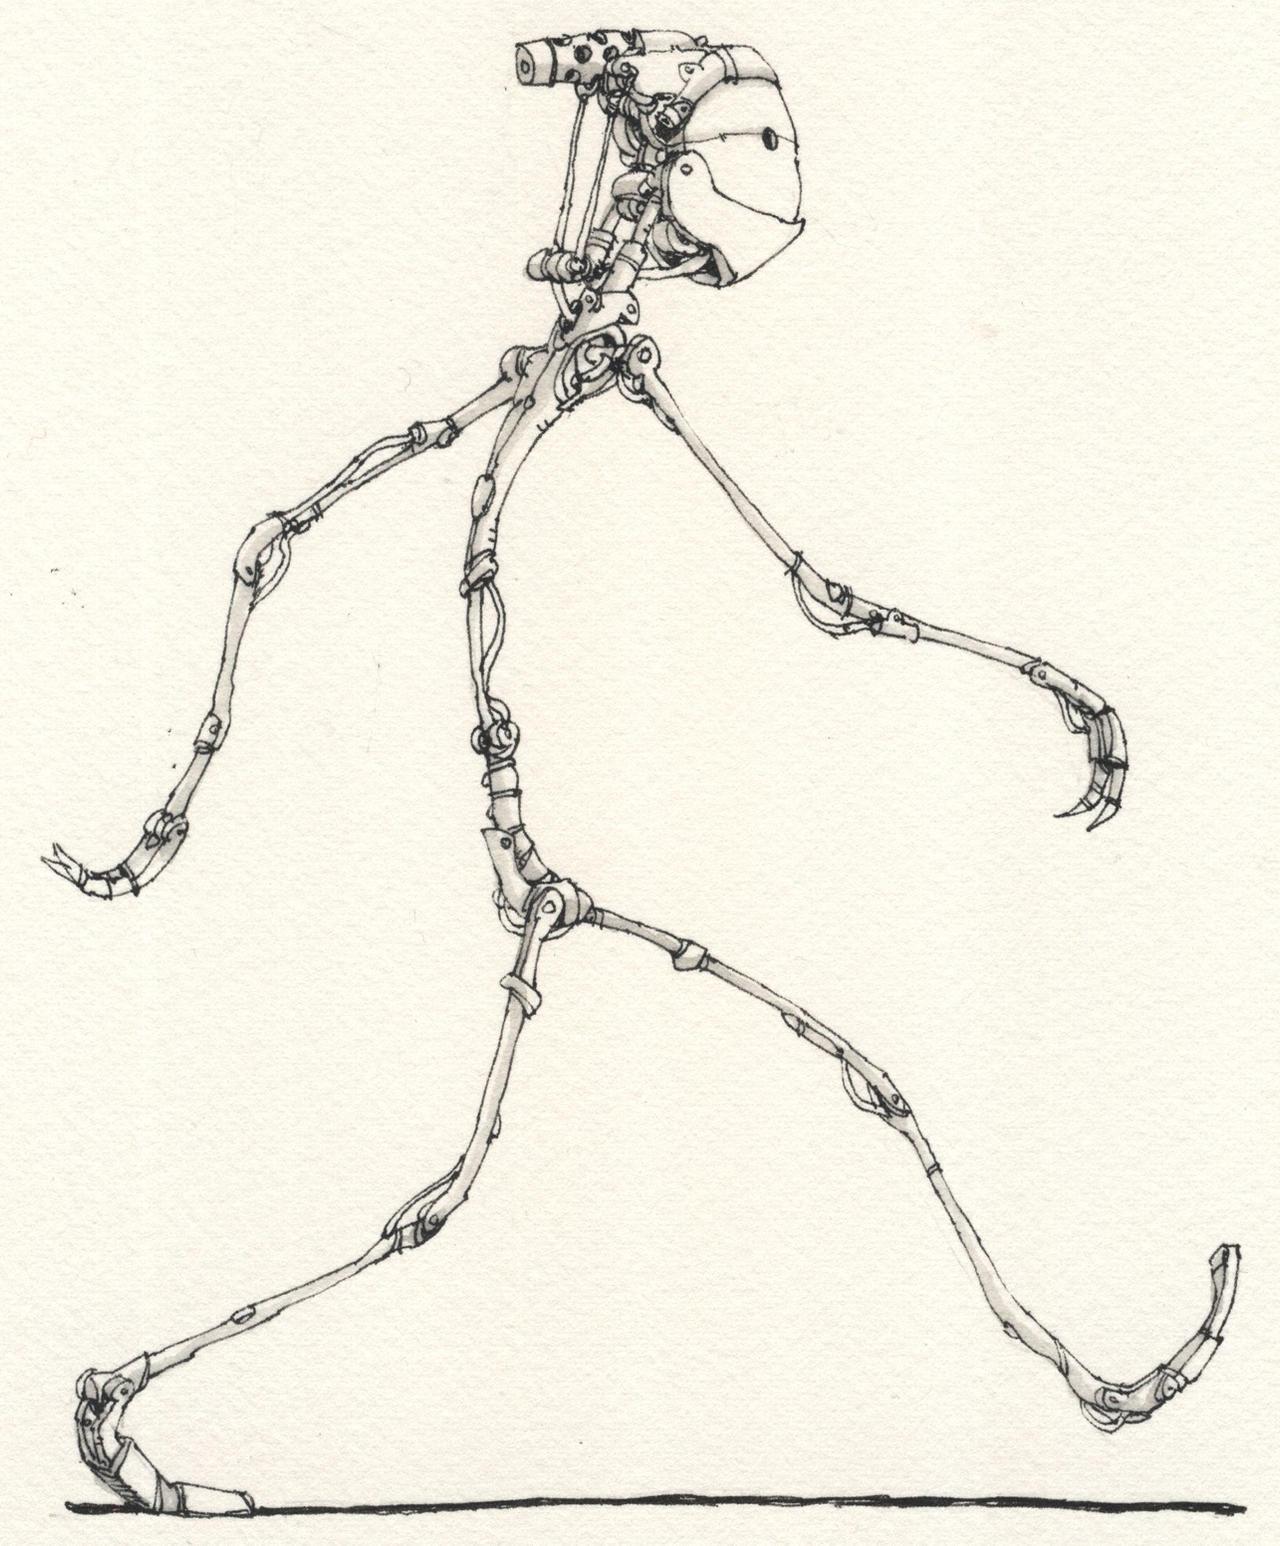 Thin Robot